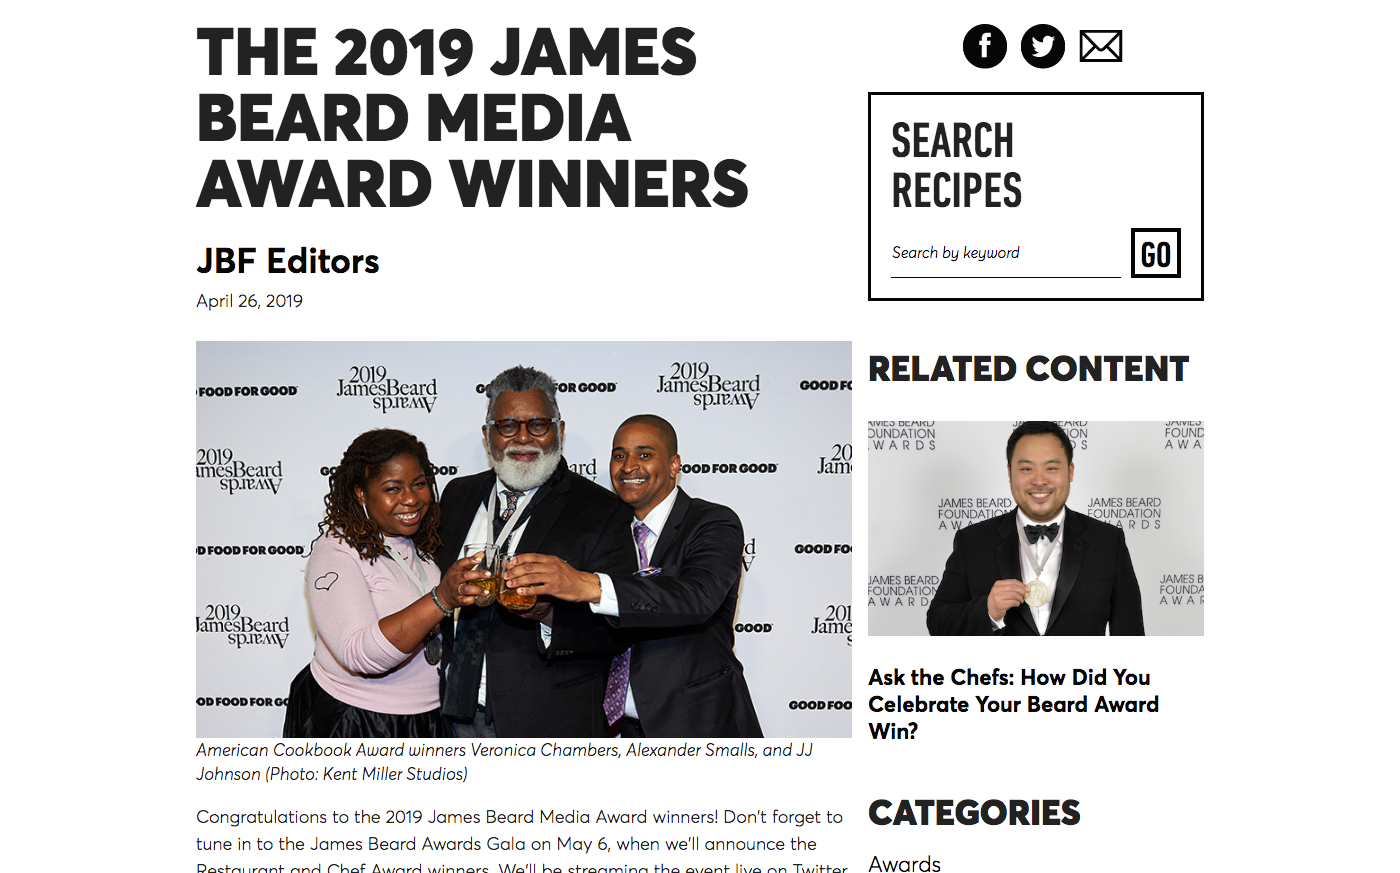 THE 2019 JAMES BEARD MEDIA AWARD WINNERS